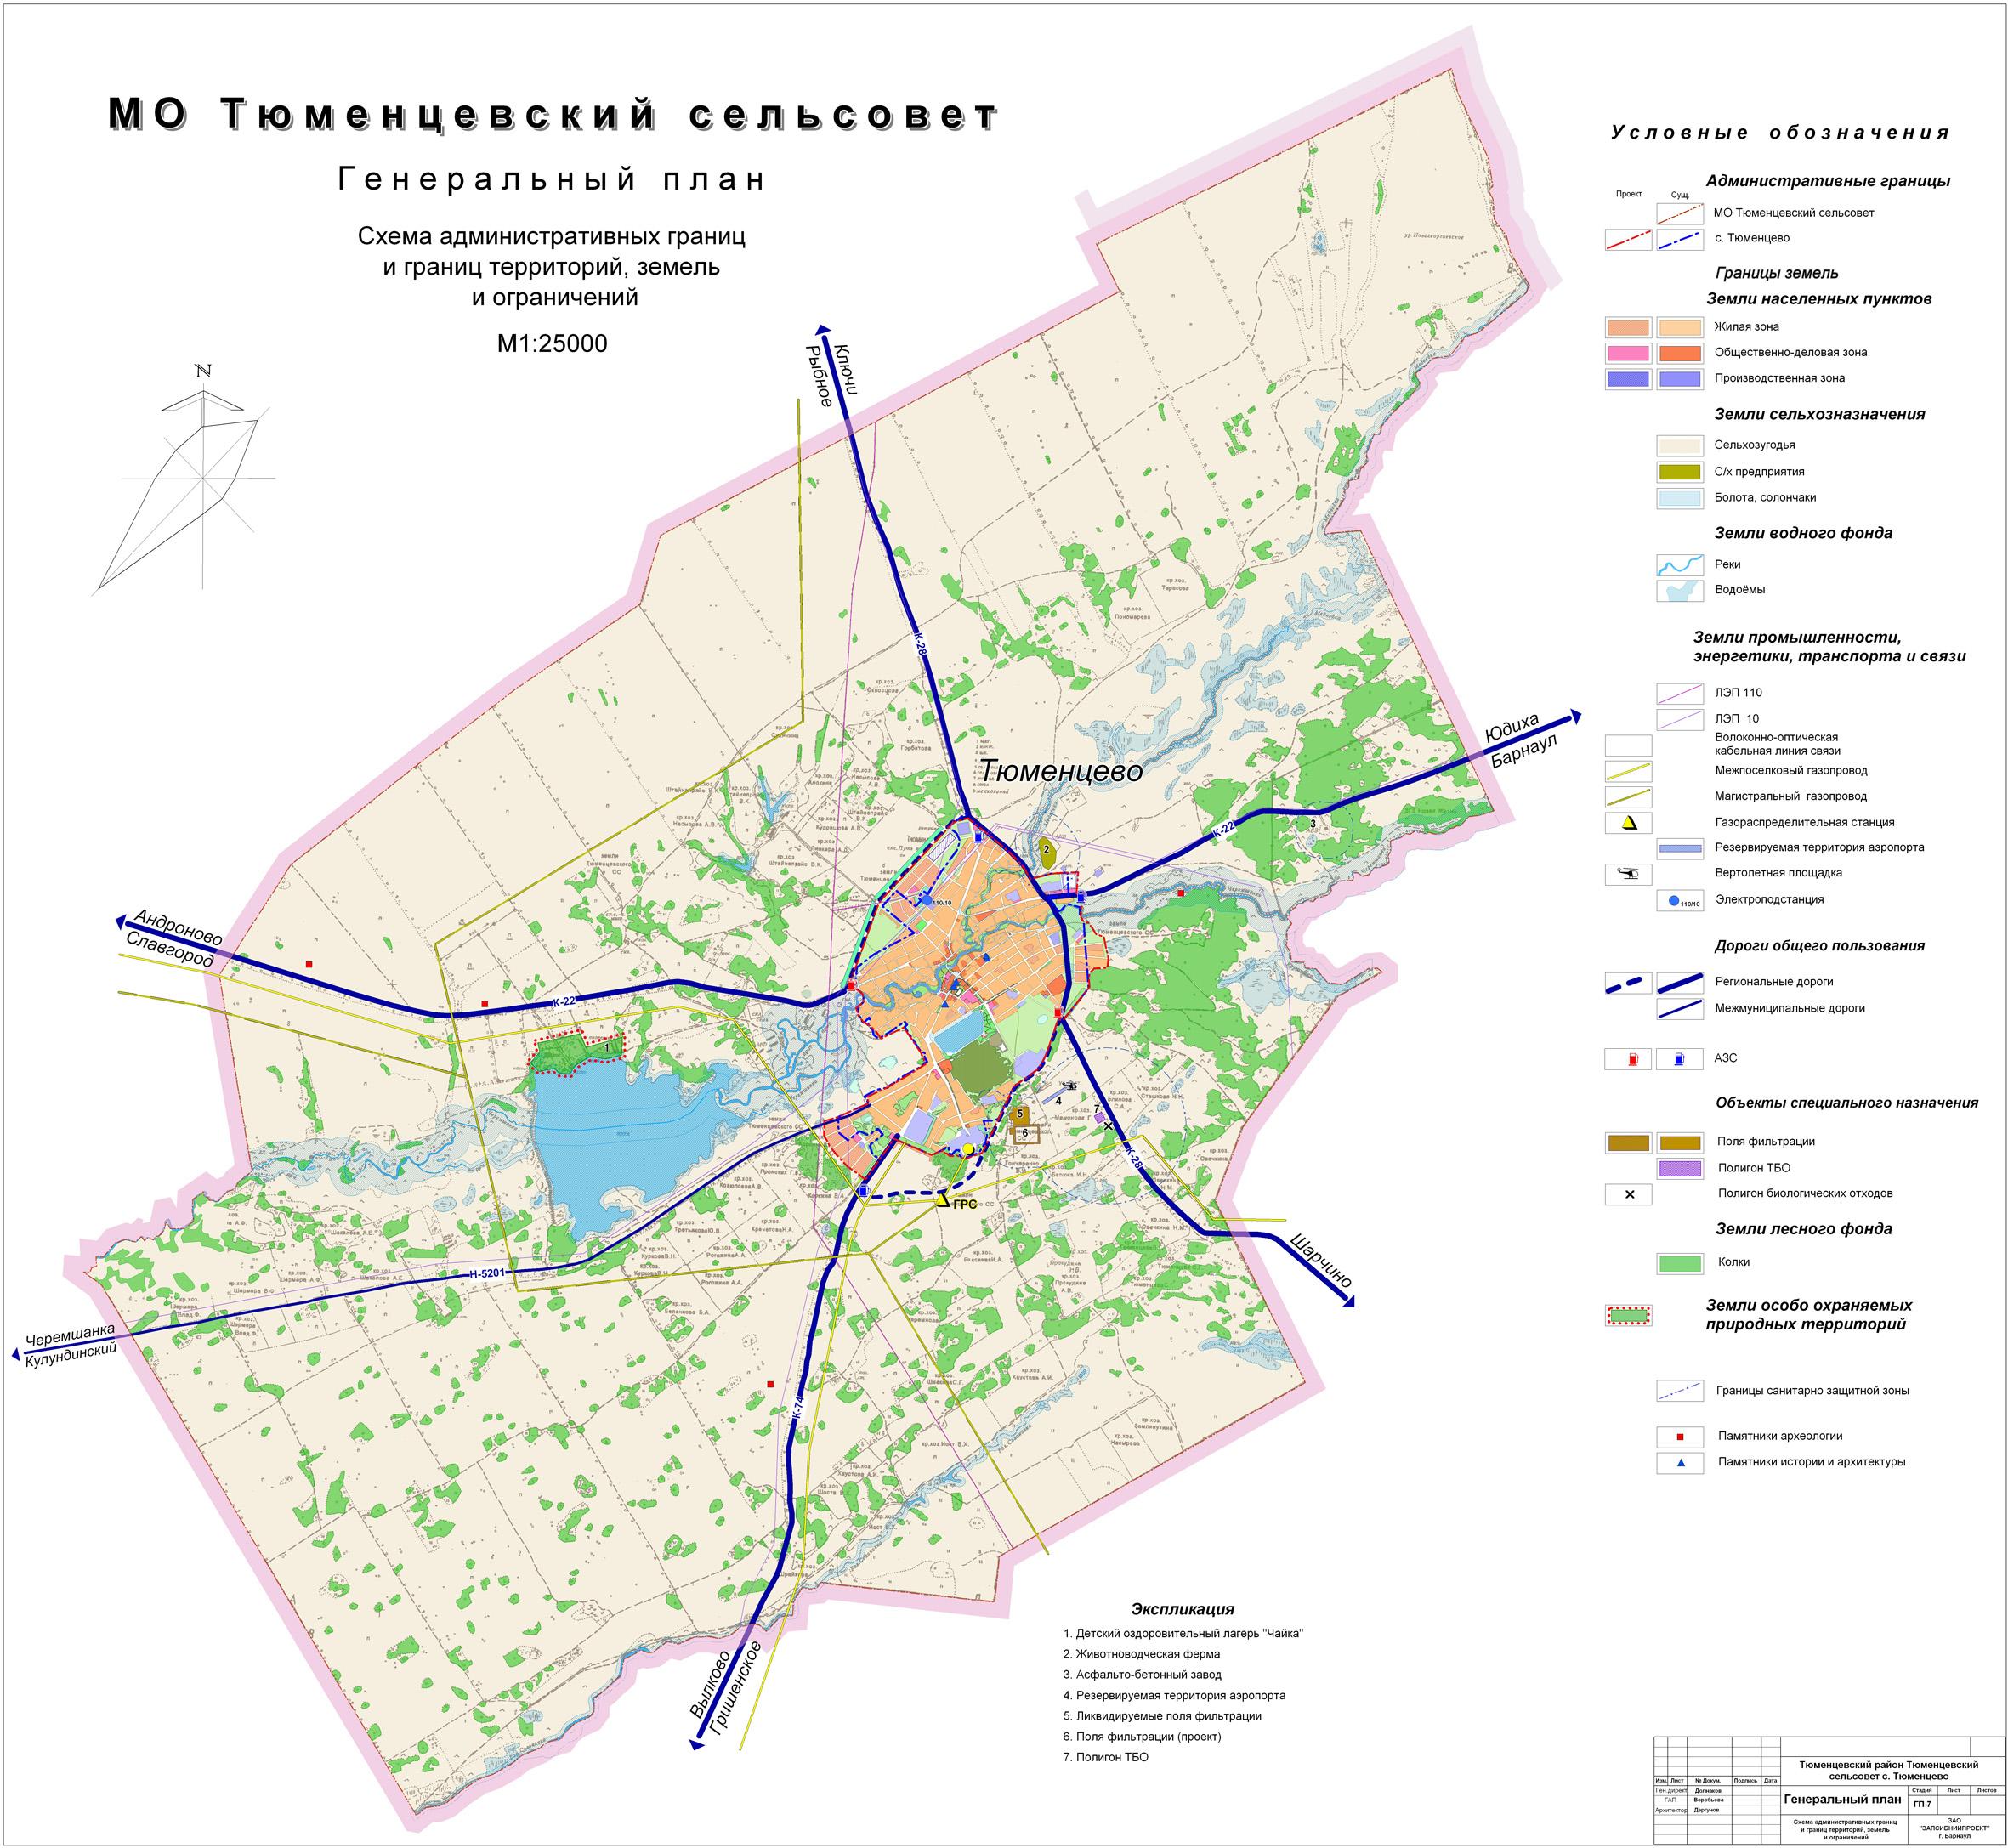 http://tumencevo.ucoz.ru/2012/Arhitektor/skhema_administrativnykh_granic_i_granic_territori.jpg